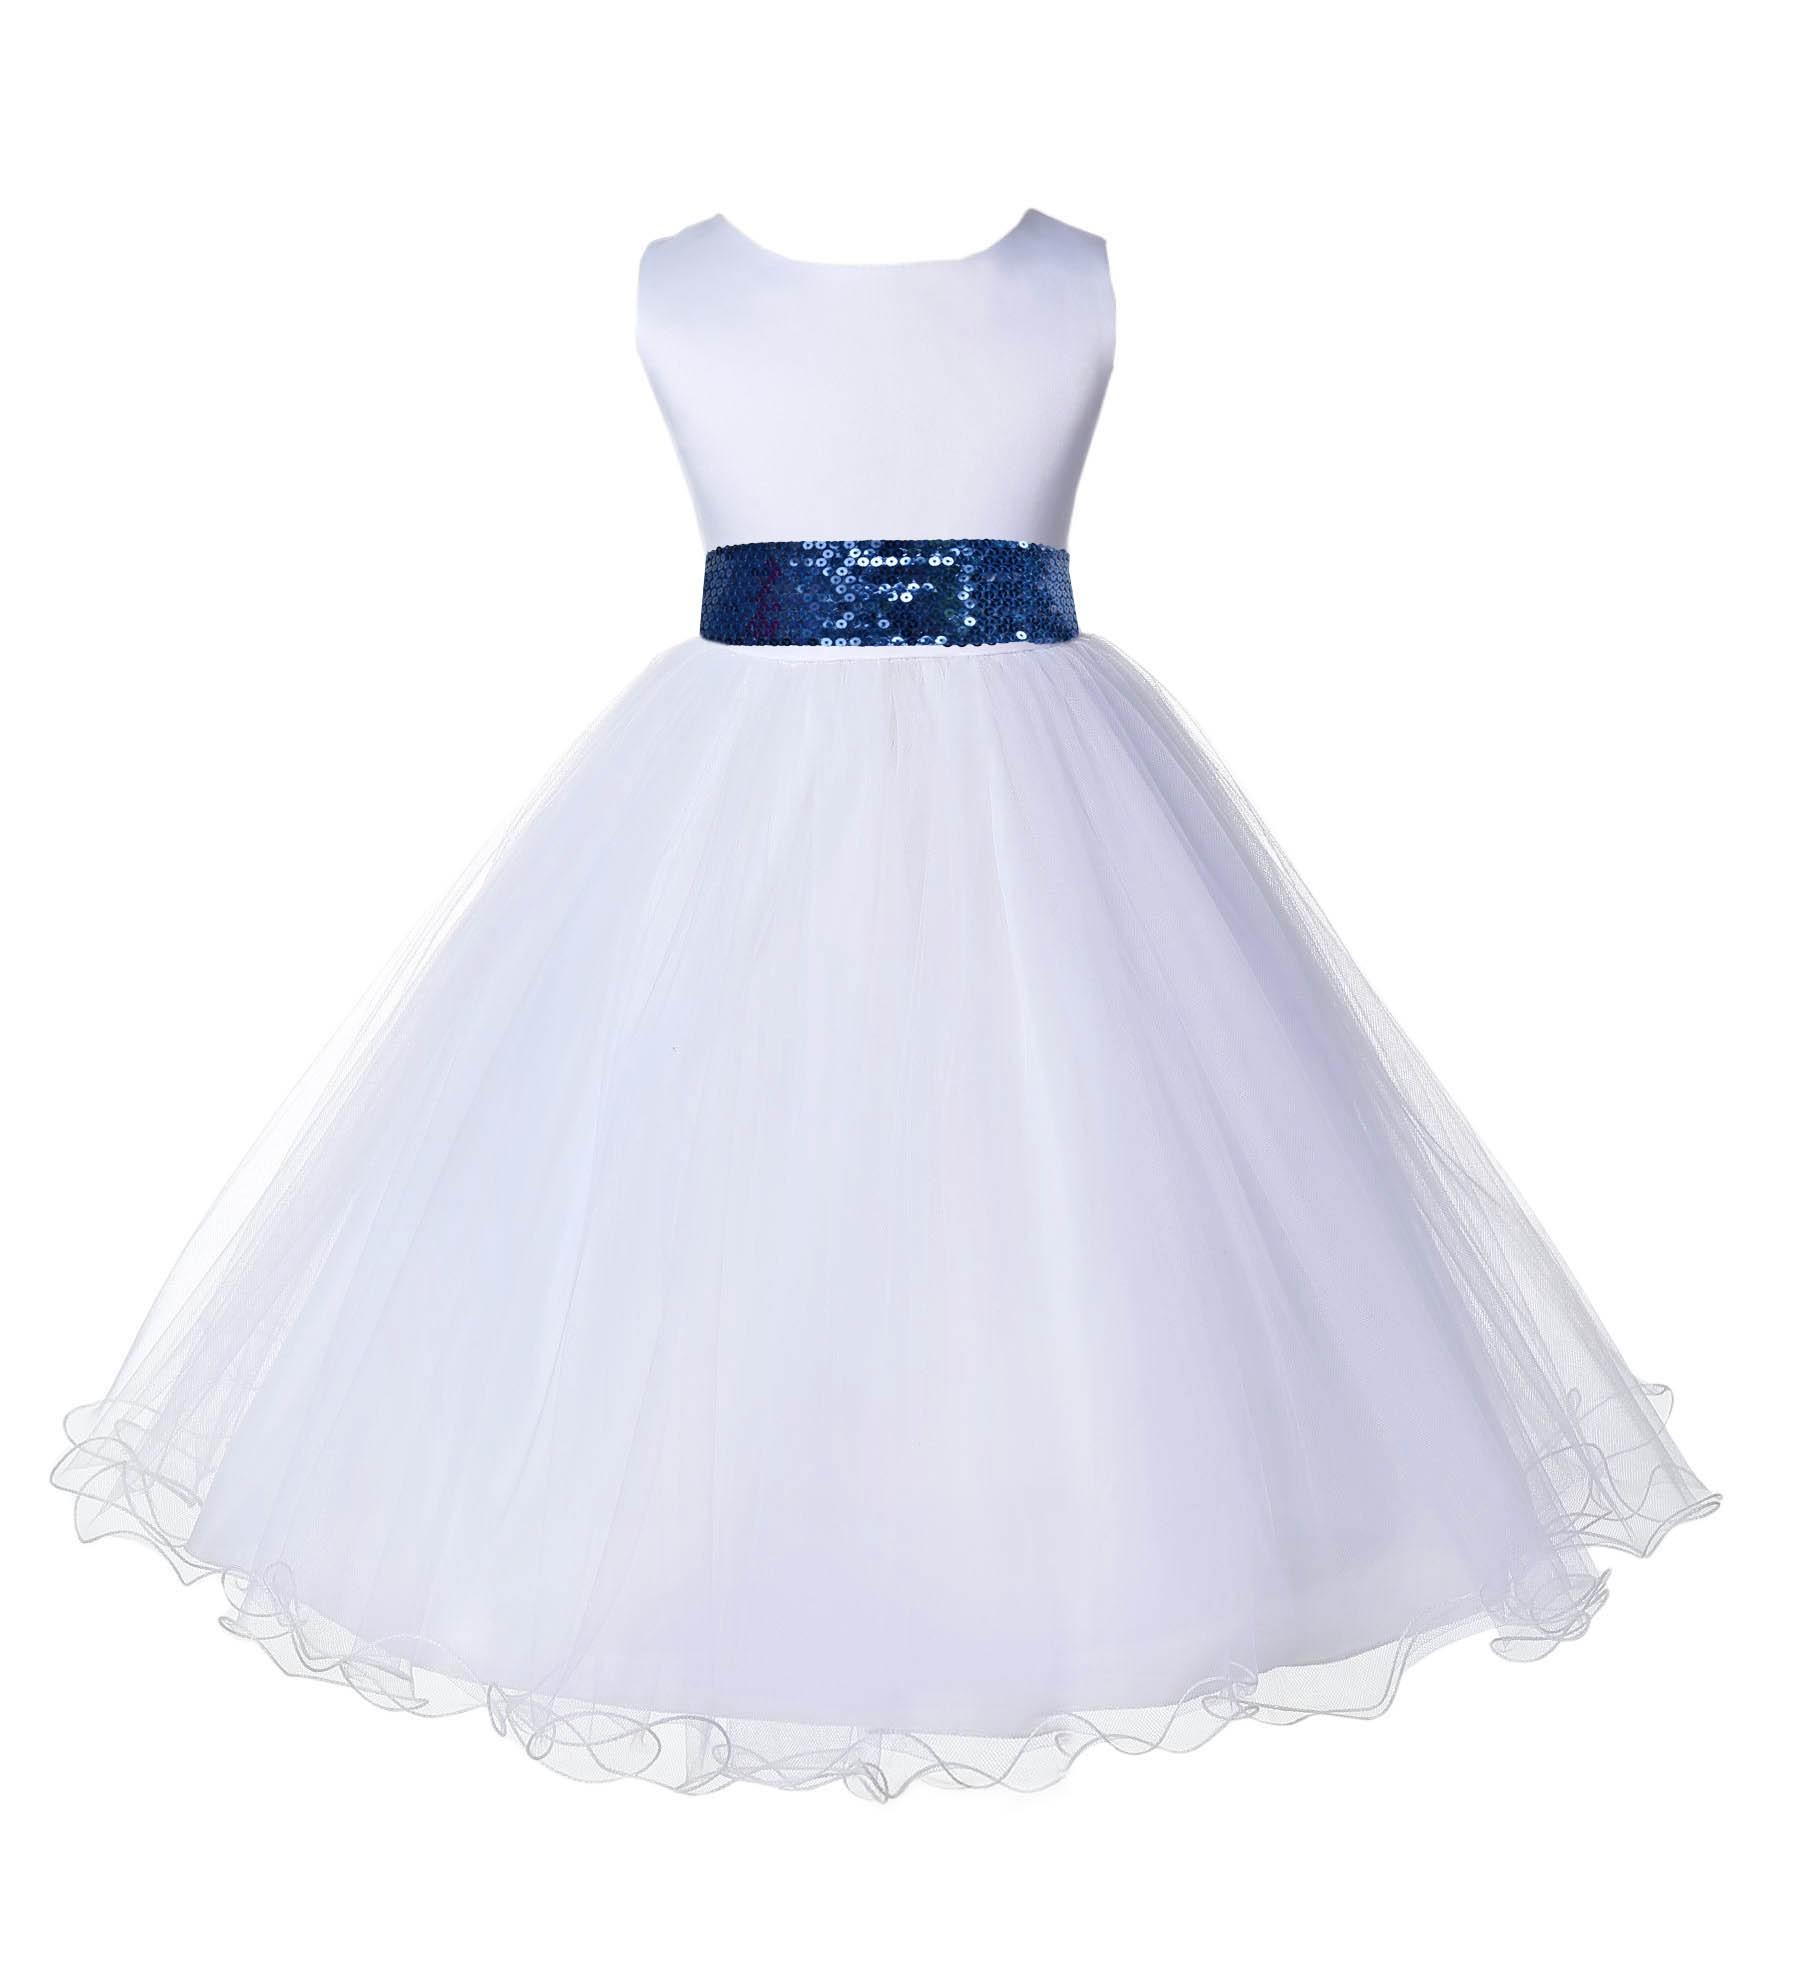 White tulle rattail edge navy sequin sash flower girl for How to ship a wedding dress usps